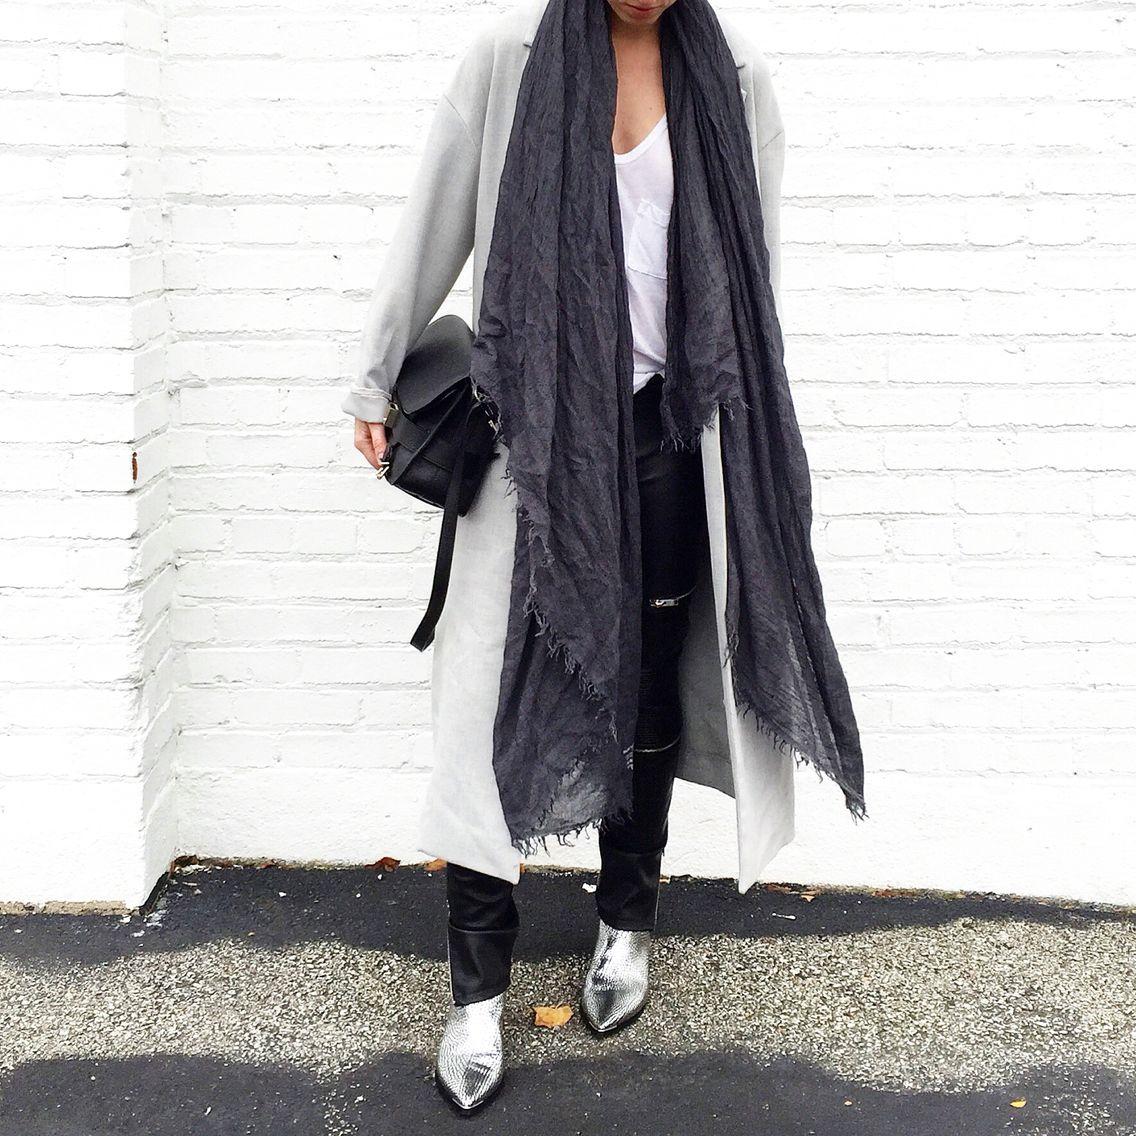 Street Style. COS coat, Isabel Marant Scarf, Zara pants. #streetstyle - OVRSLO